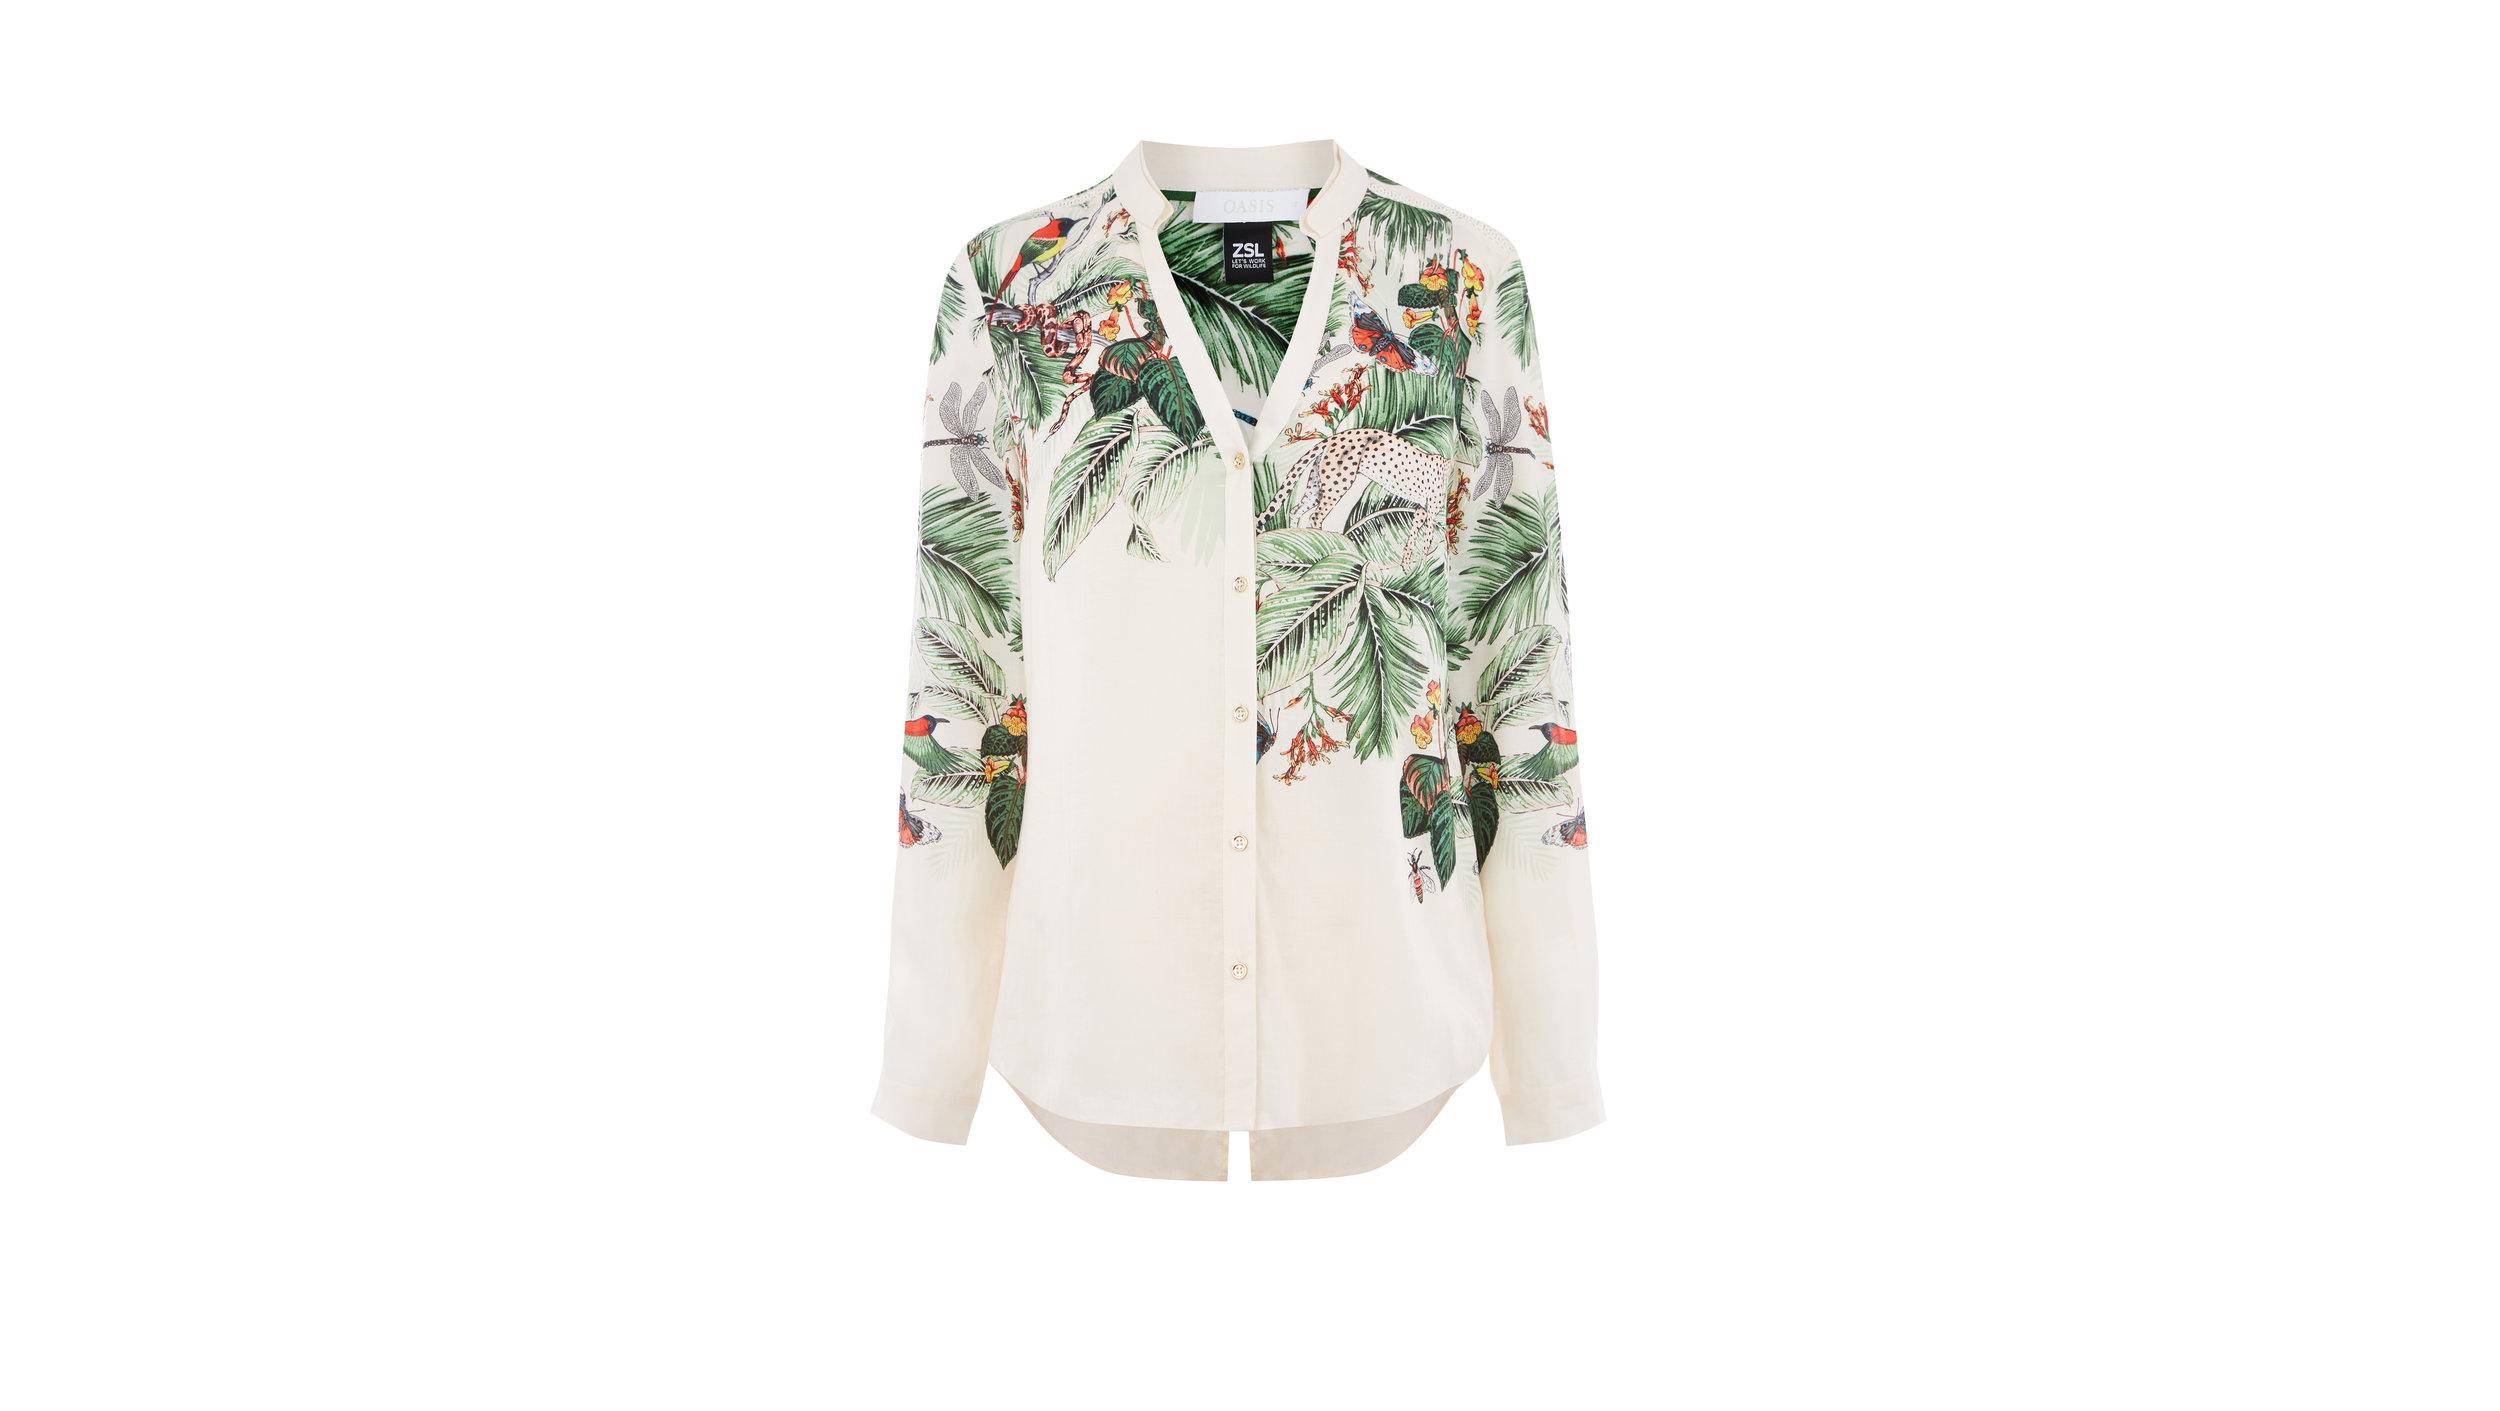 oasis-zsl-london-zoo-animal-shirt